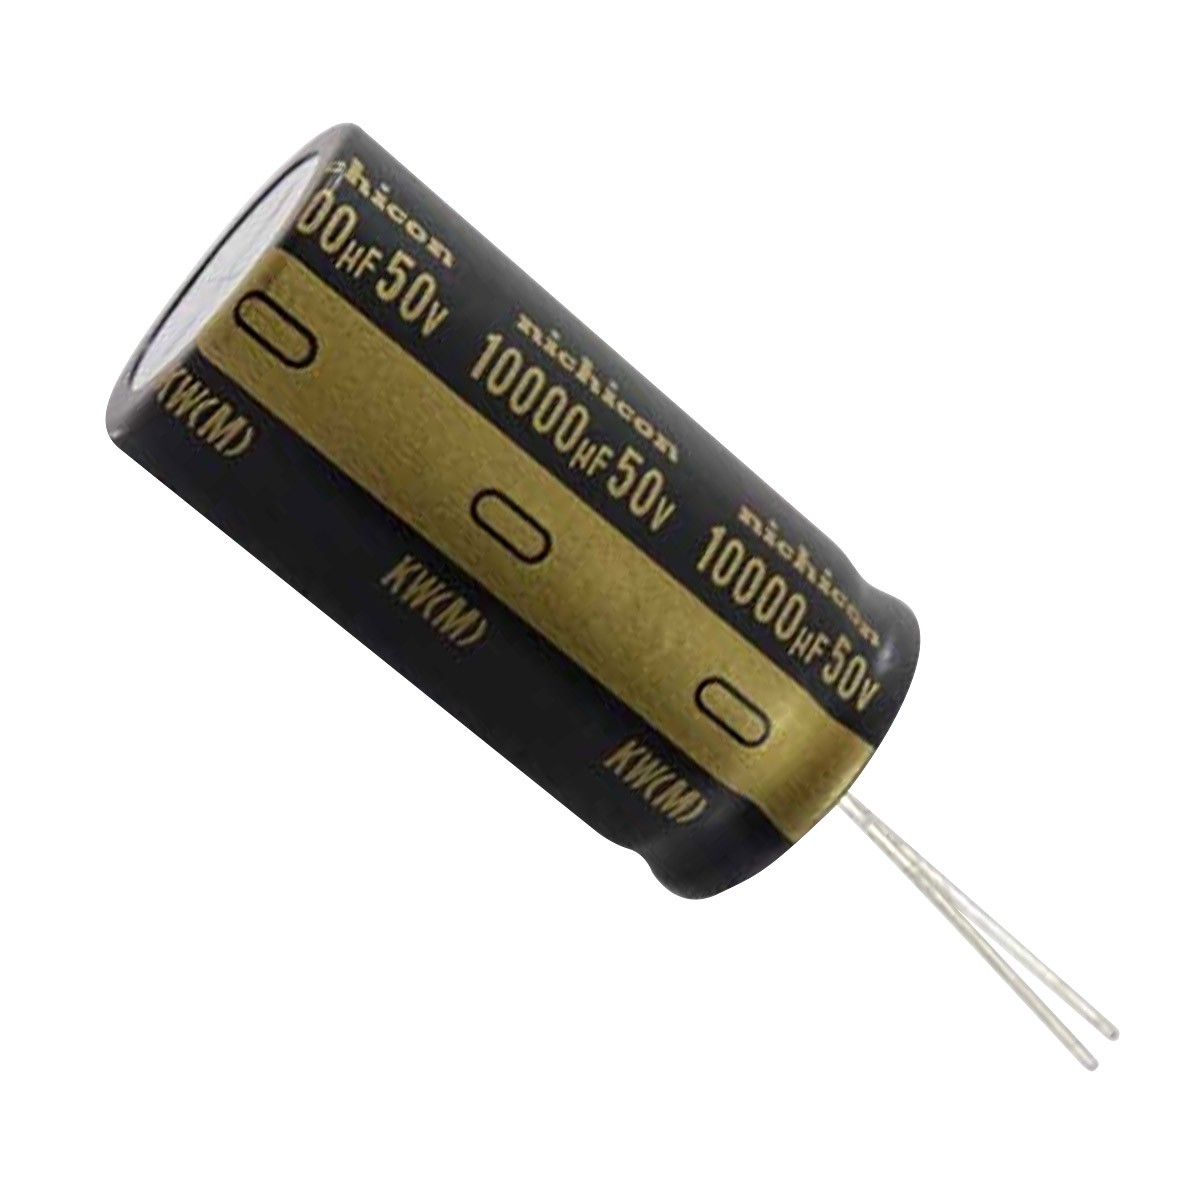 NICHICON KW Electrolytic Audio Capacitor 50V 10000μF